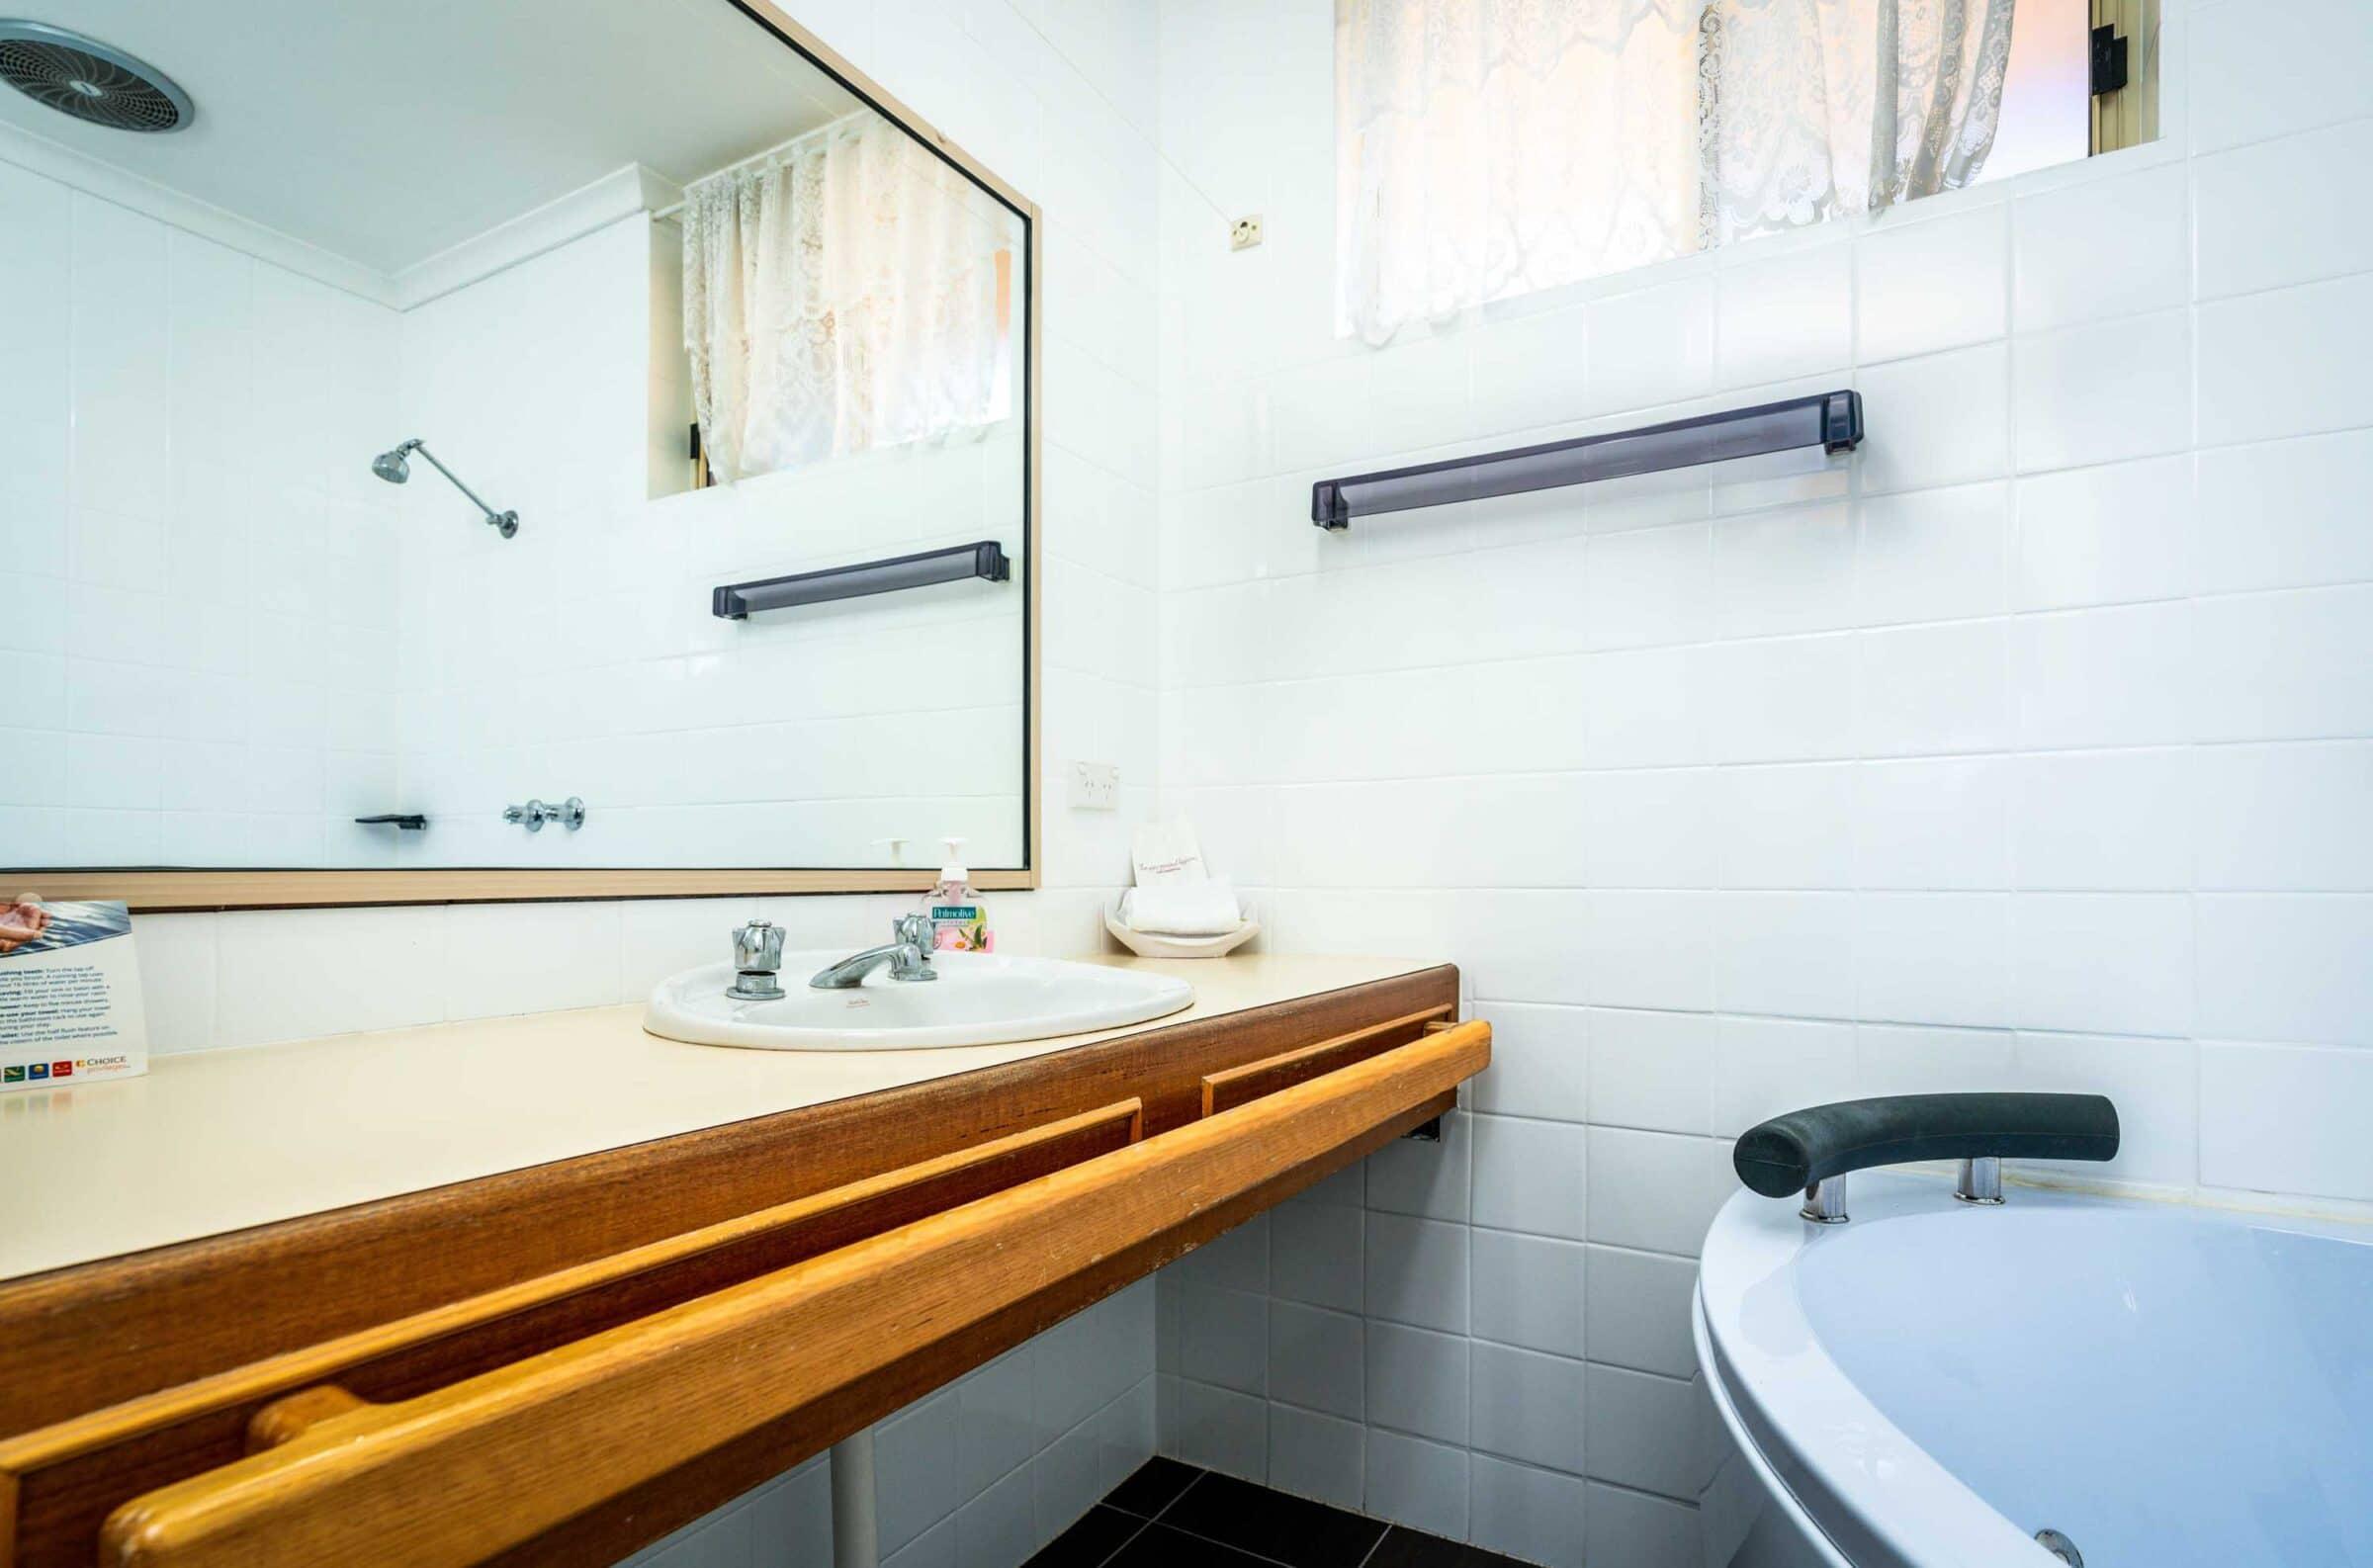 12-Bathroom-12 Small Suite Merimbula Motel Accommodation - Comfort Inn Merimbula